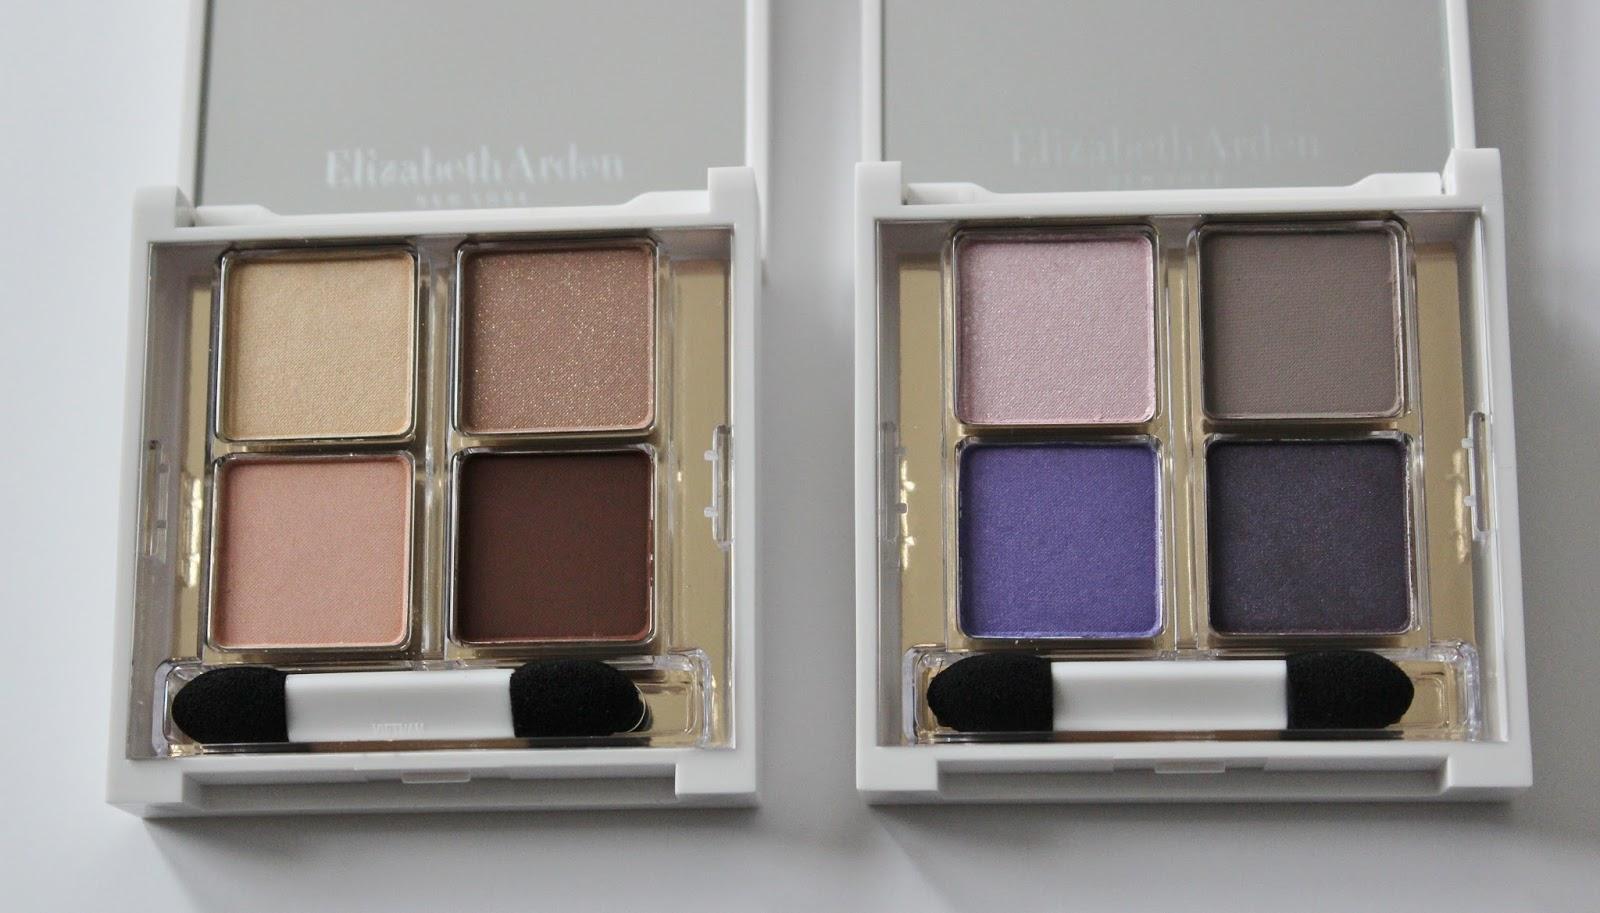 Elizabeth Arden untold aw14 makeup launches eyeshadow quads